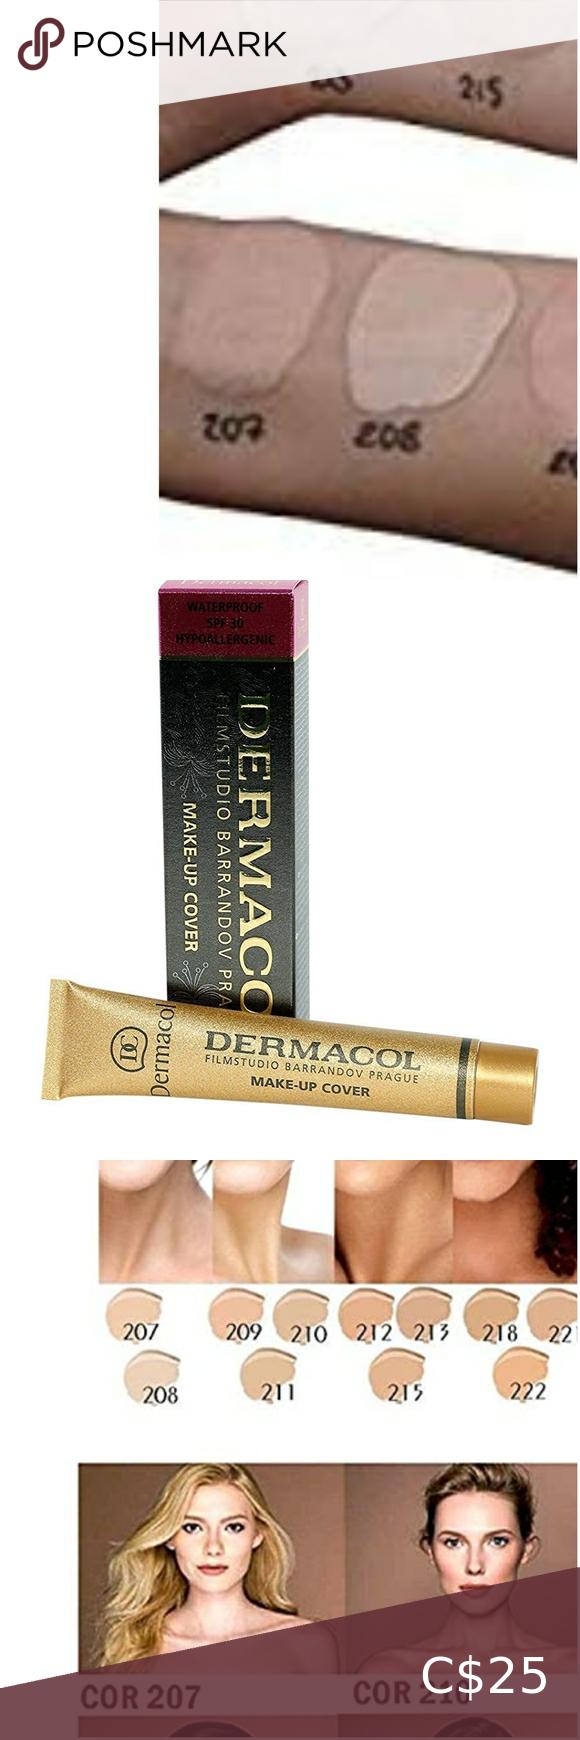 2 NEW dermacol makeup cover foundation in 2020 Concealer